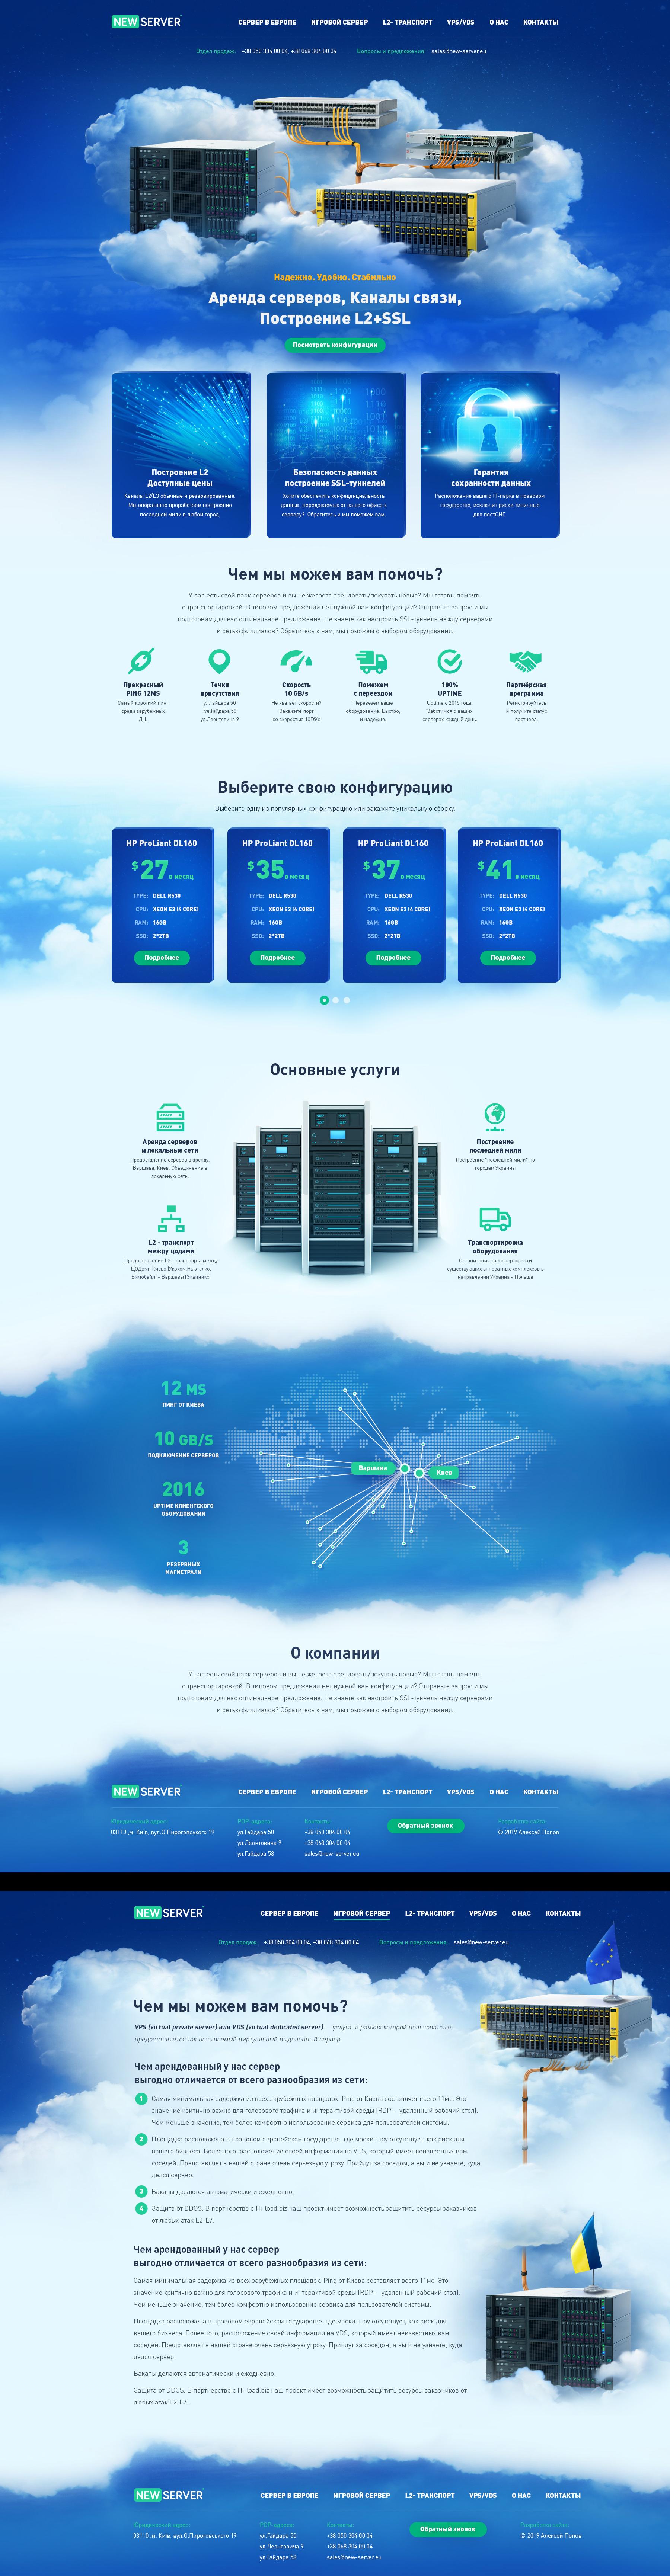 Хостинг-компания New Server